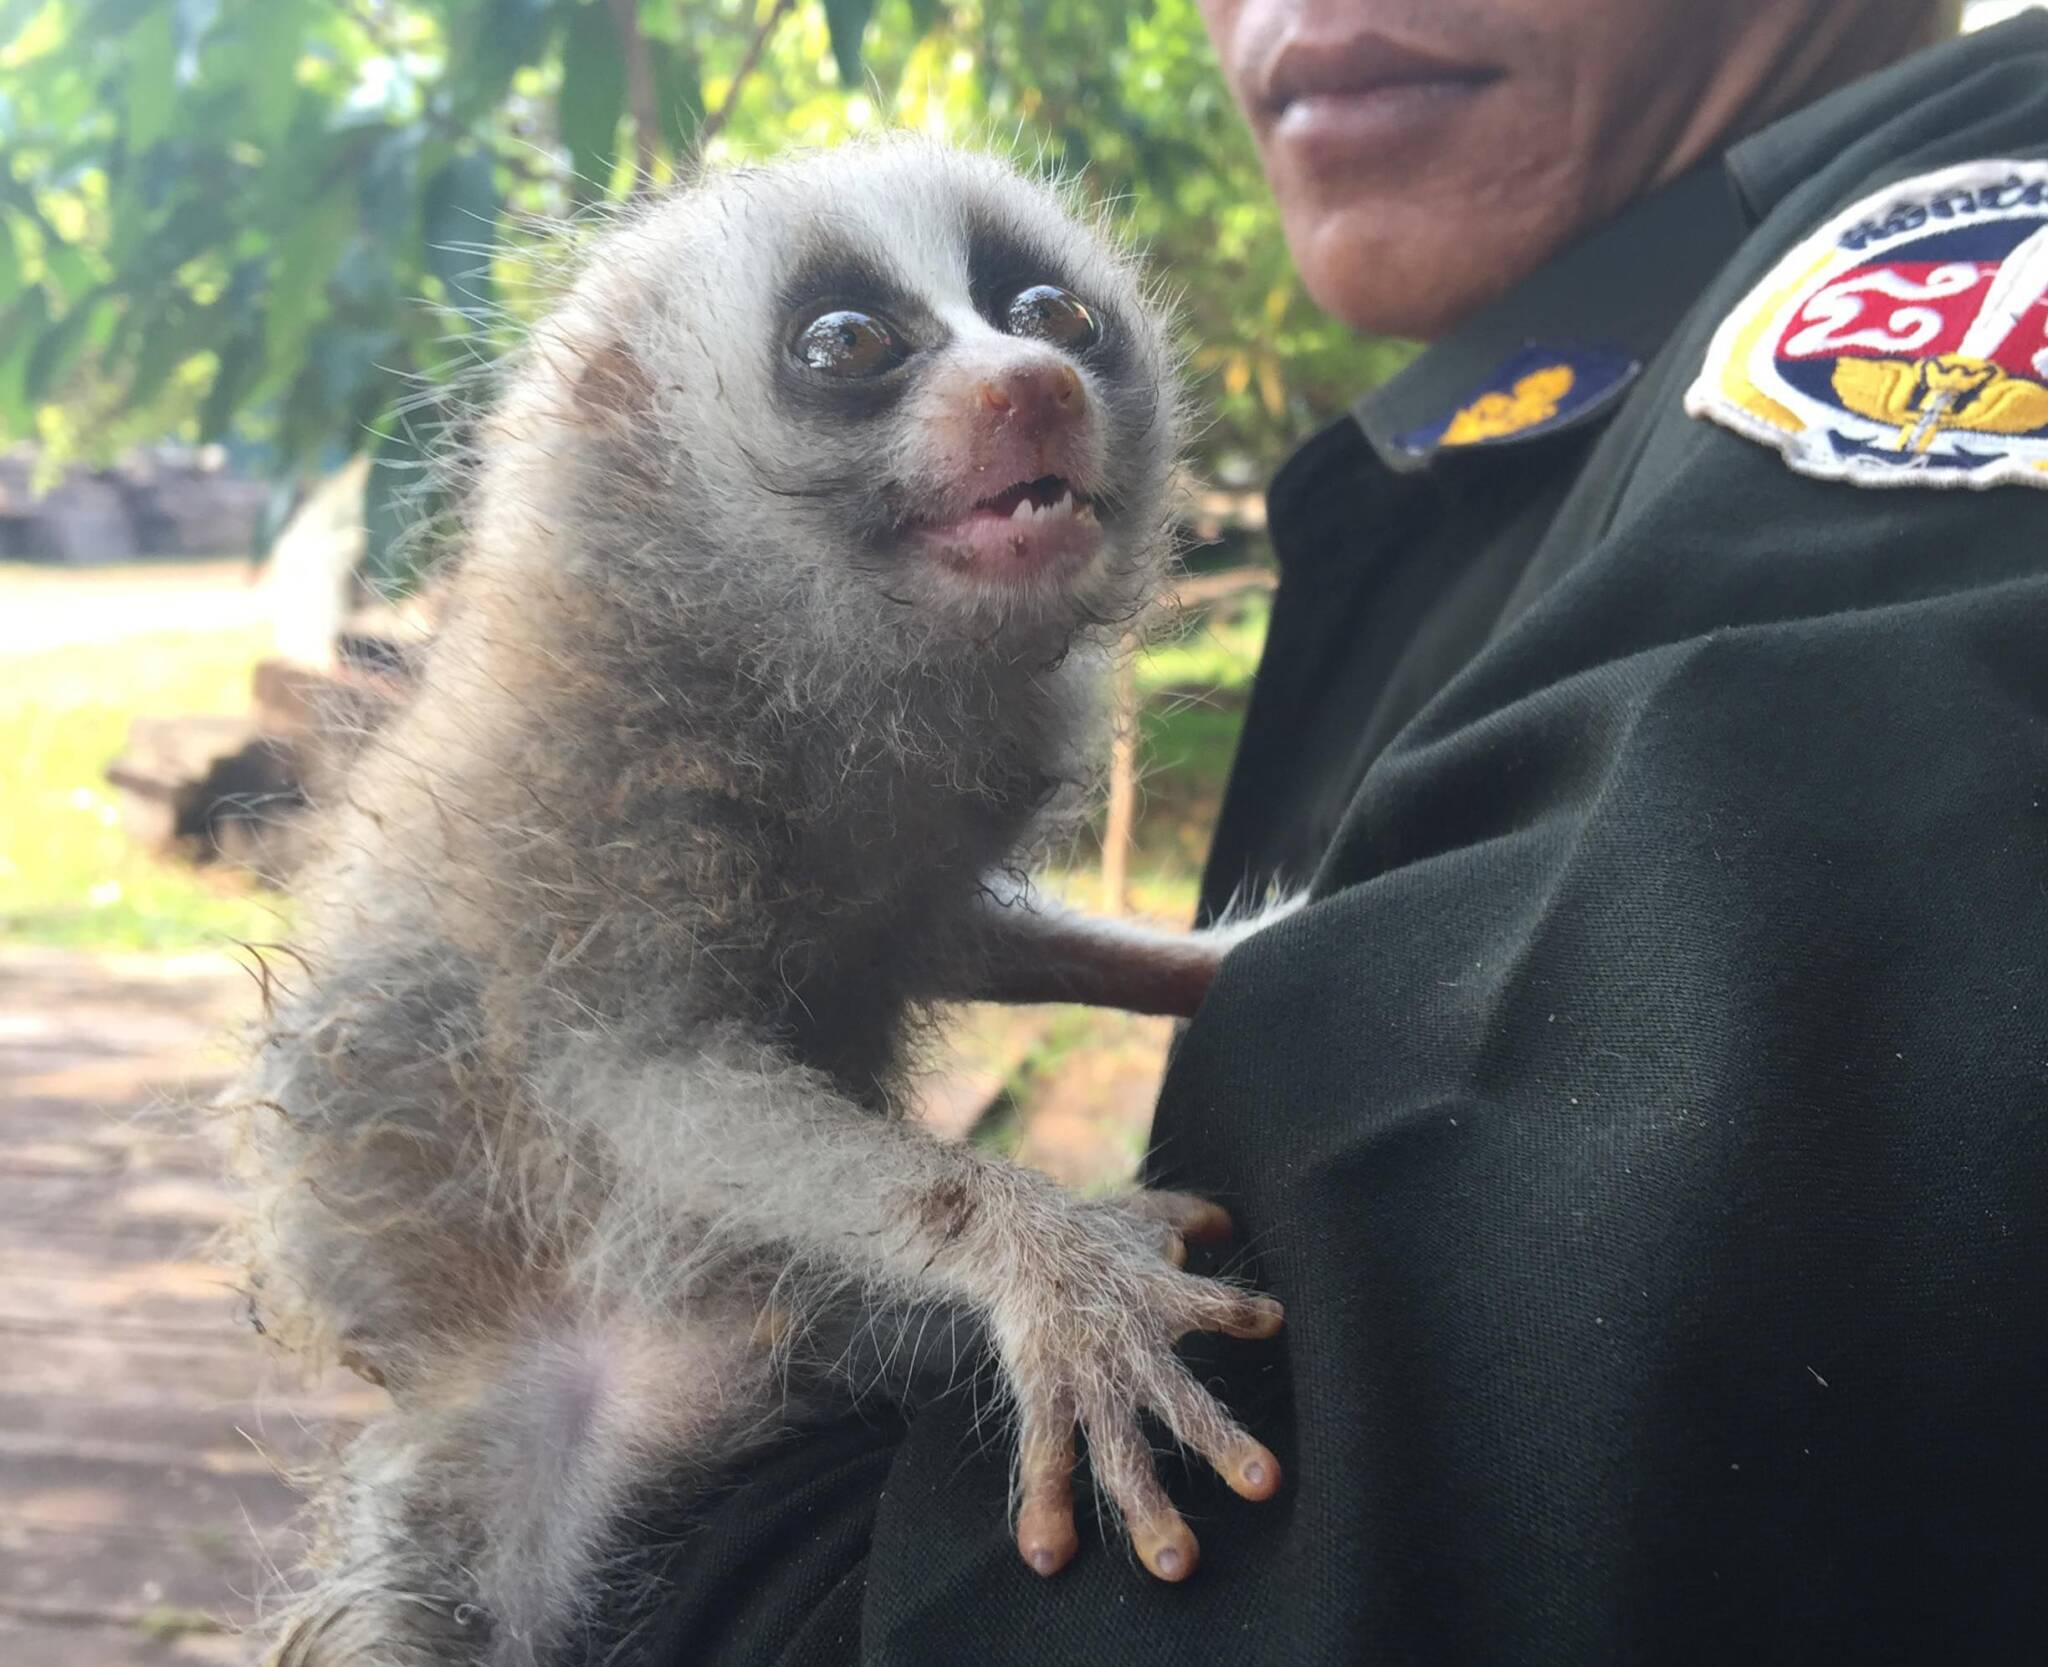 poaching Rangers combat poaching, human-wildlife conflict and the illegal pet trade slow loris pet trade